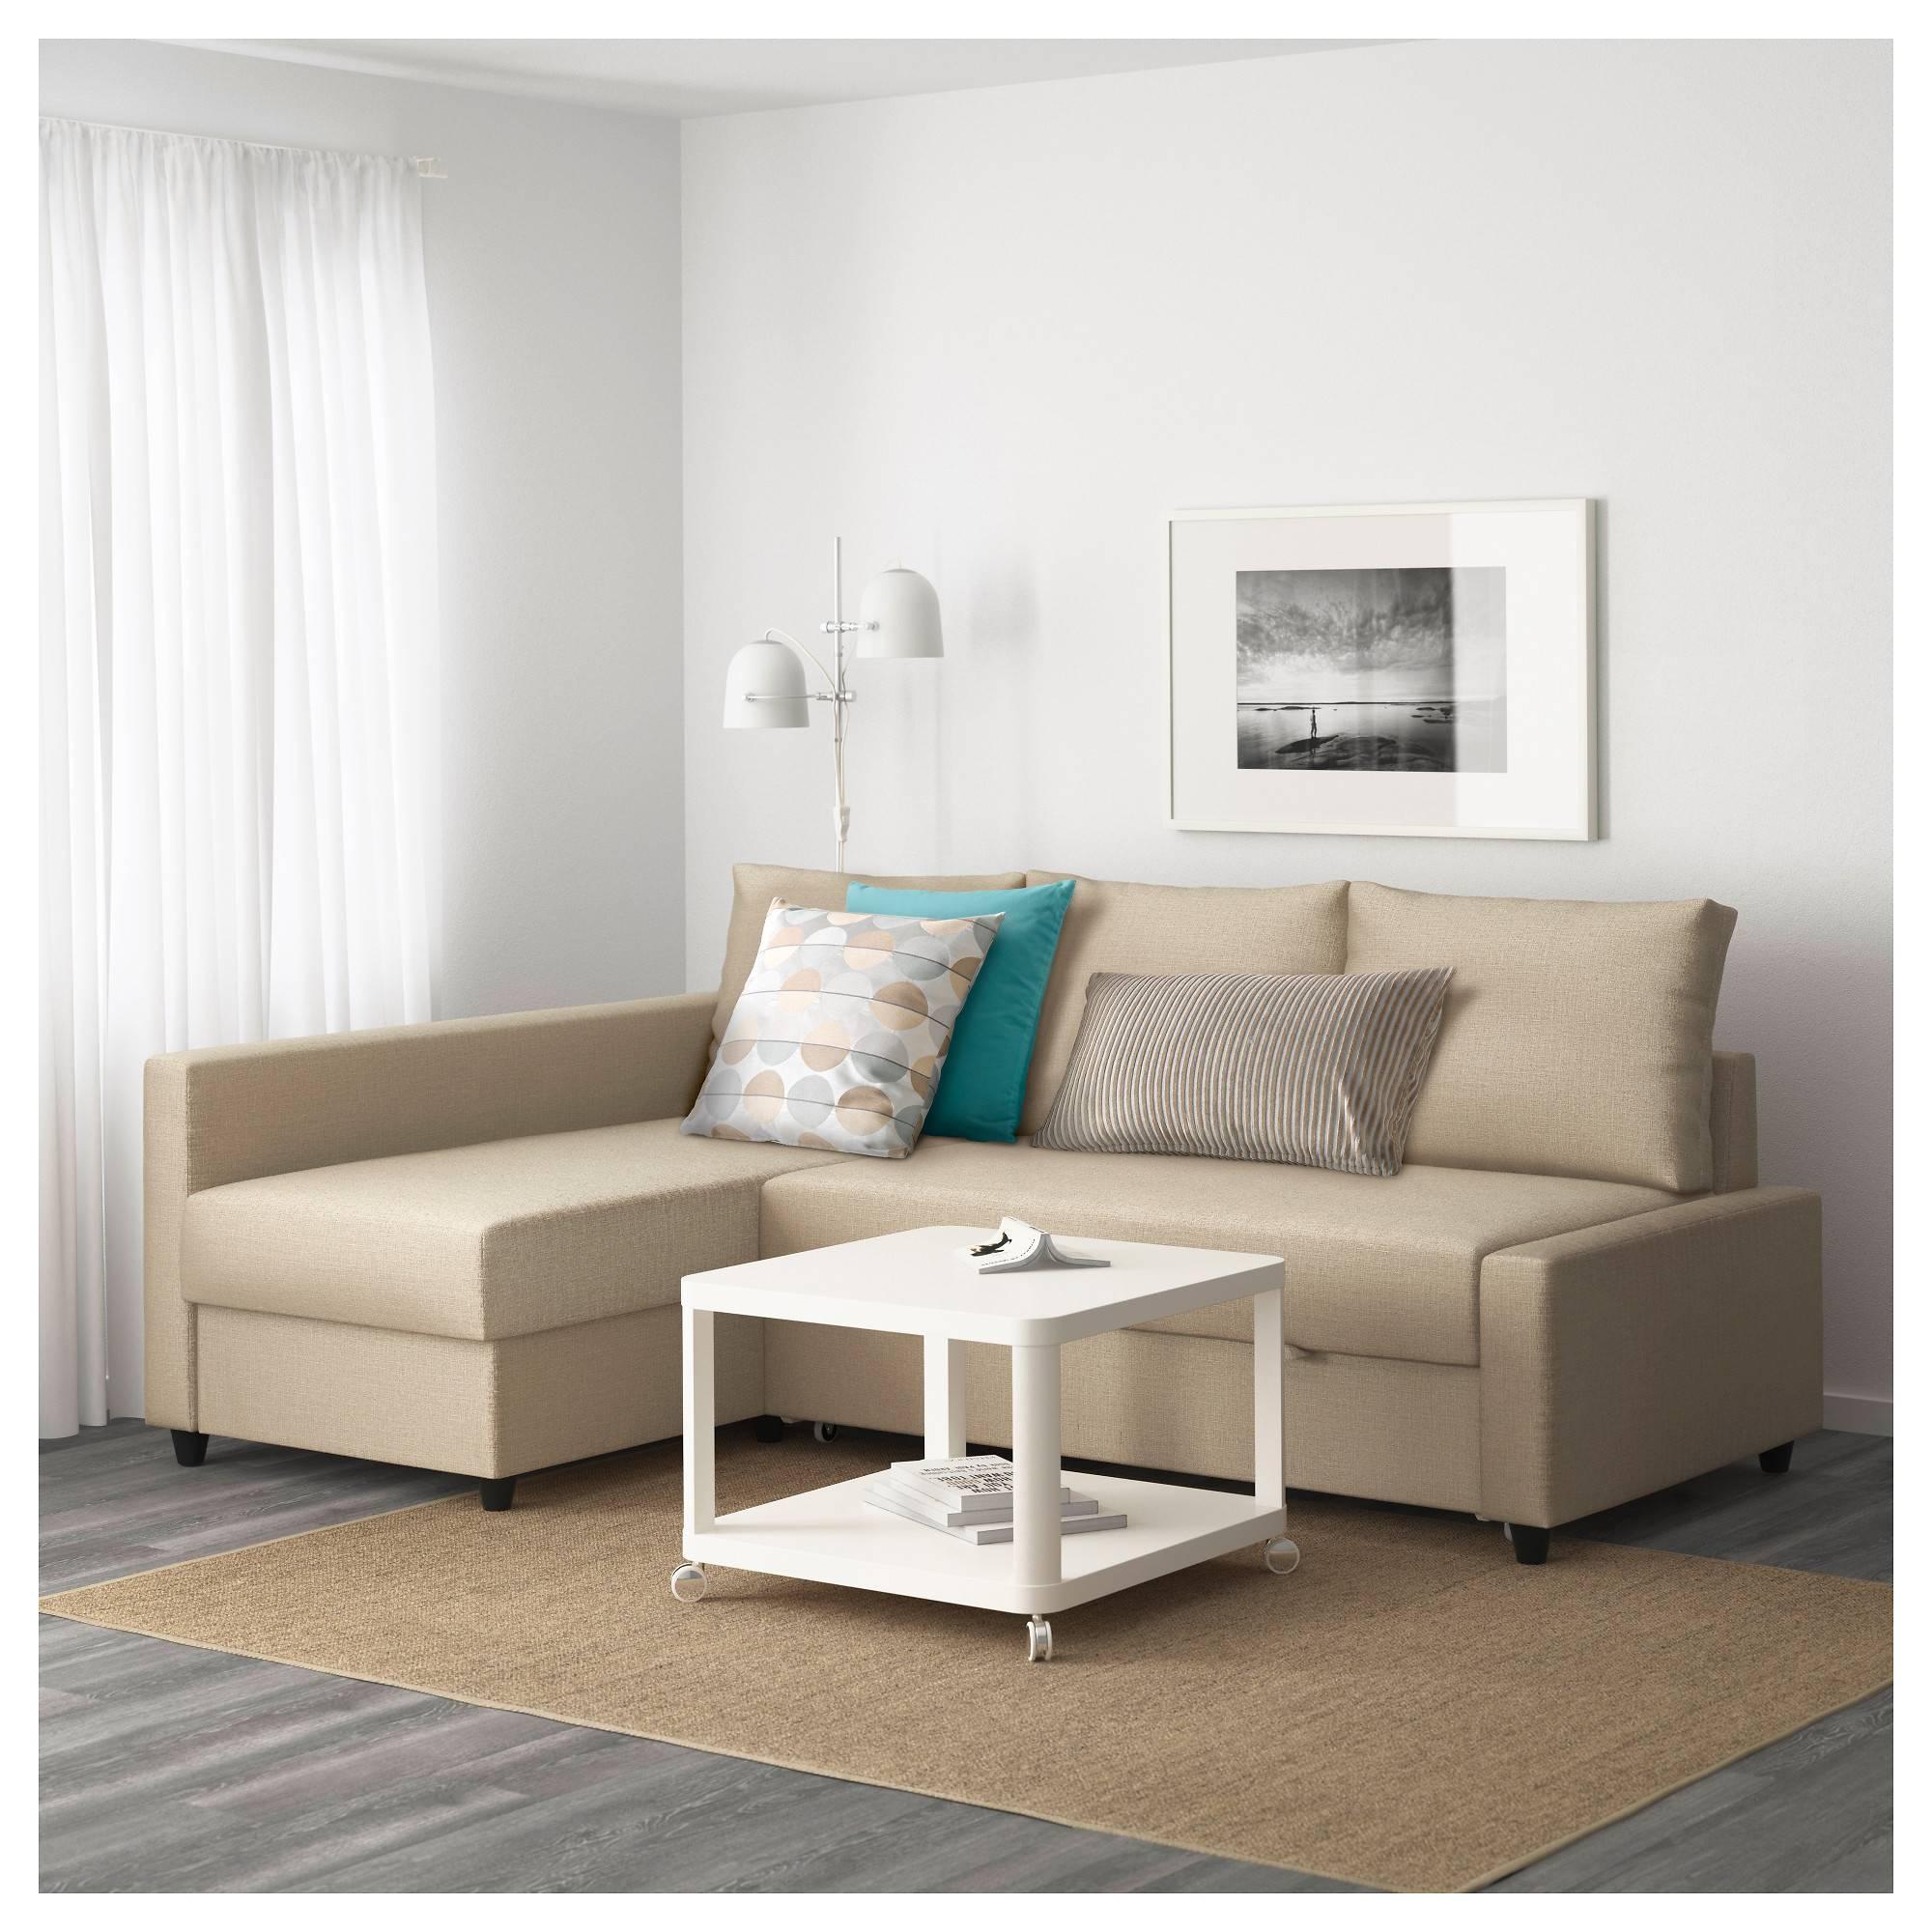 Friheten Corner Sofa-Bed With Storage - Skiftebo Dark Orange - Ikea for Corner Sofa Bed With Storage Ikea (Image 8 of 30)